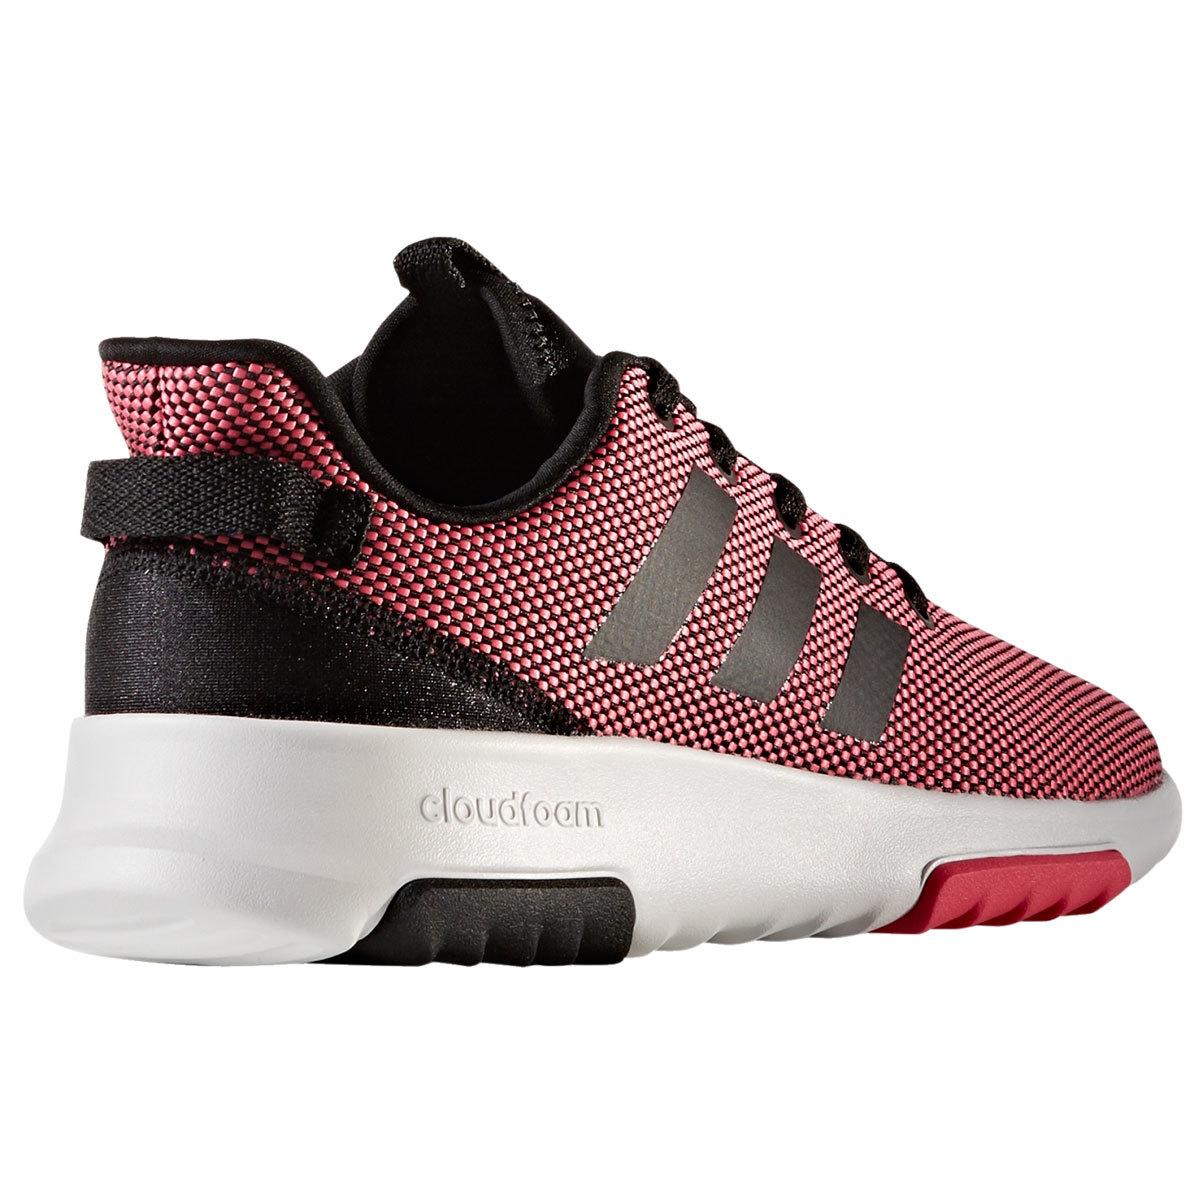 ADIDAS Big Girls' Neo Cloudfoam Racer TR Running Shoes, Pink/Black/White